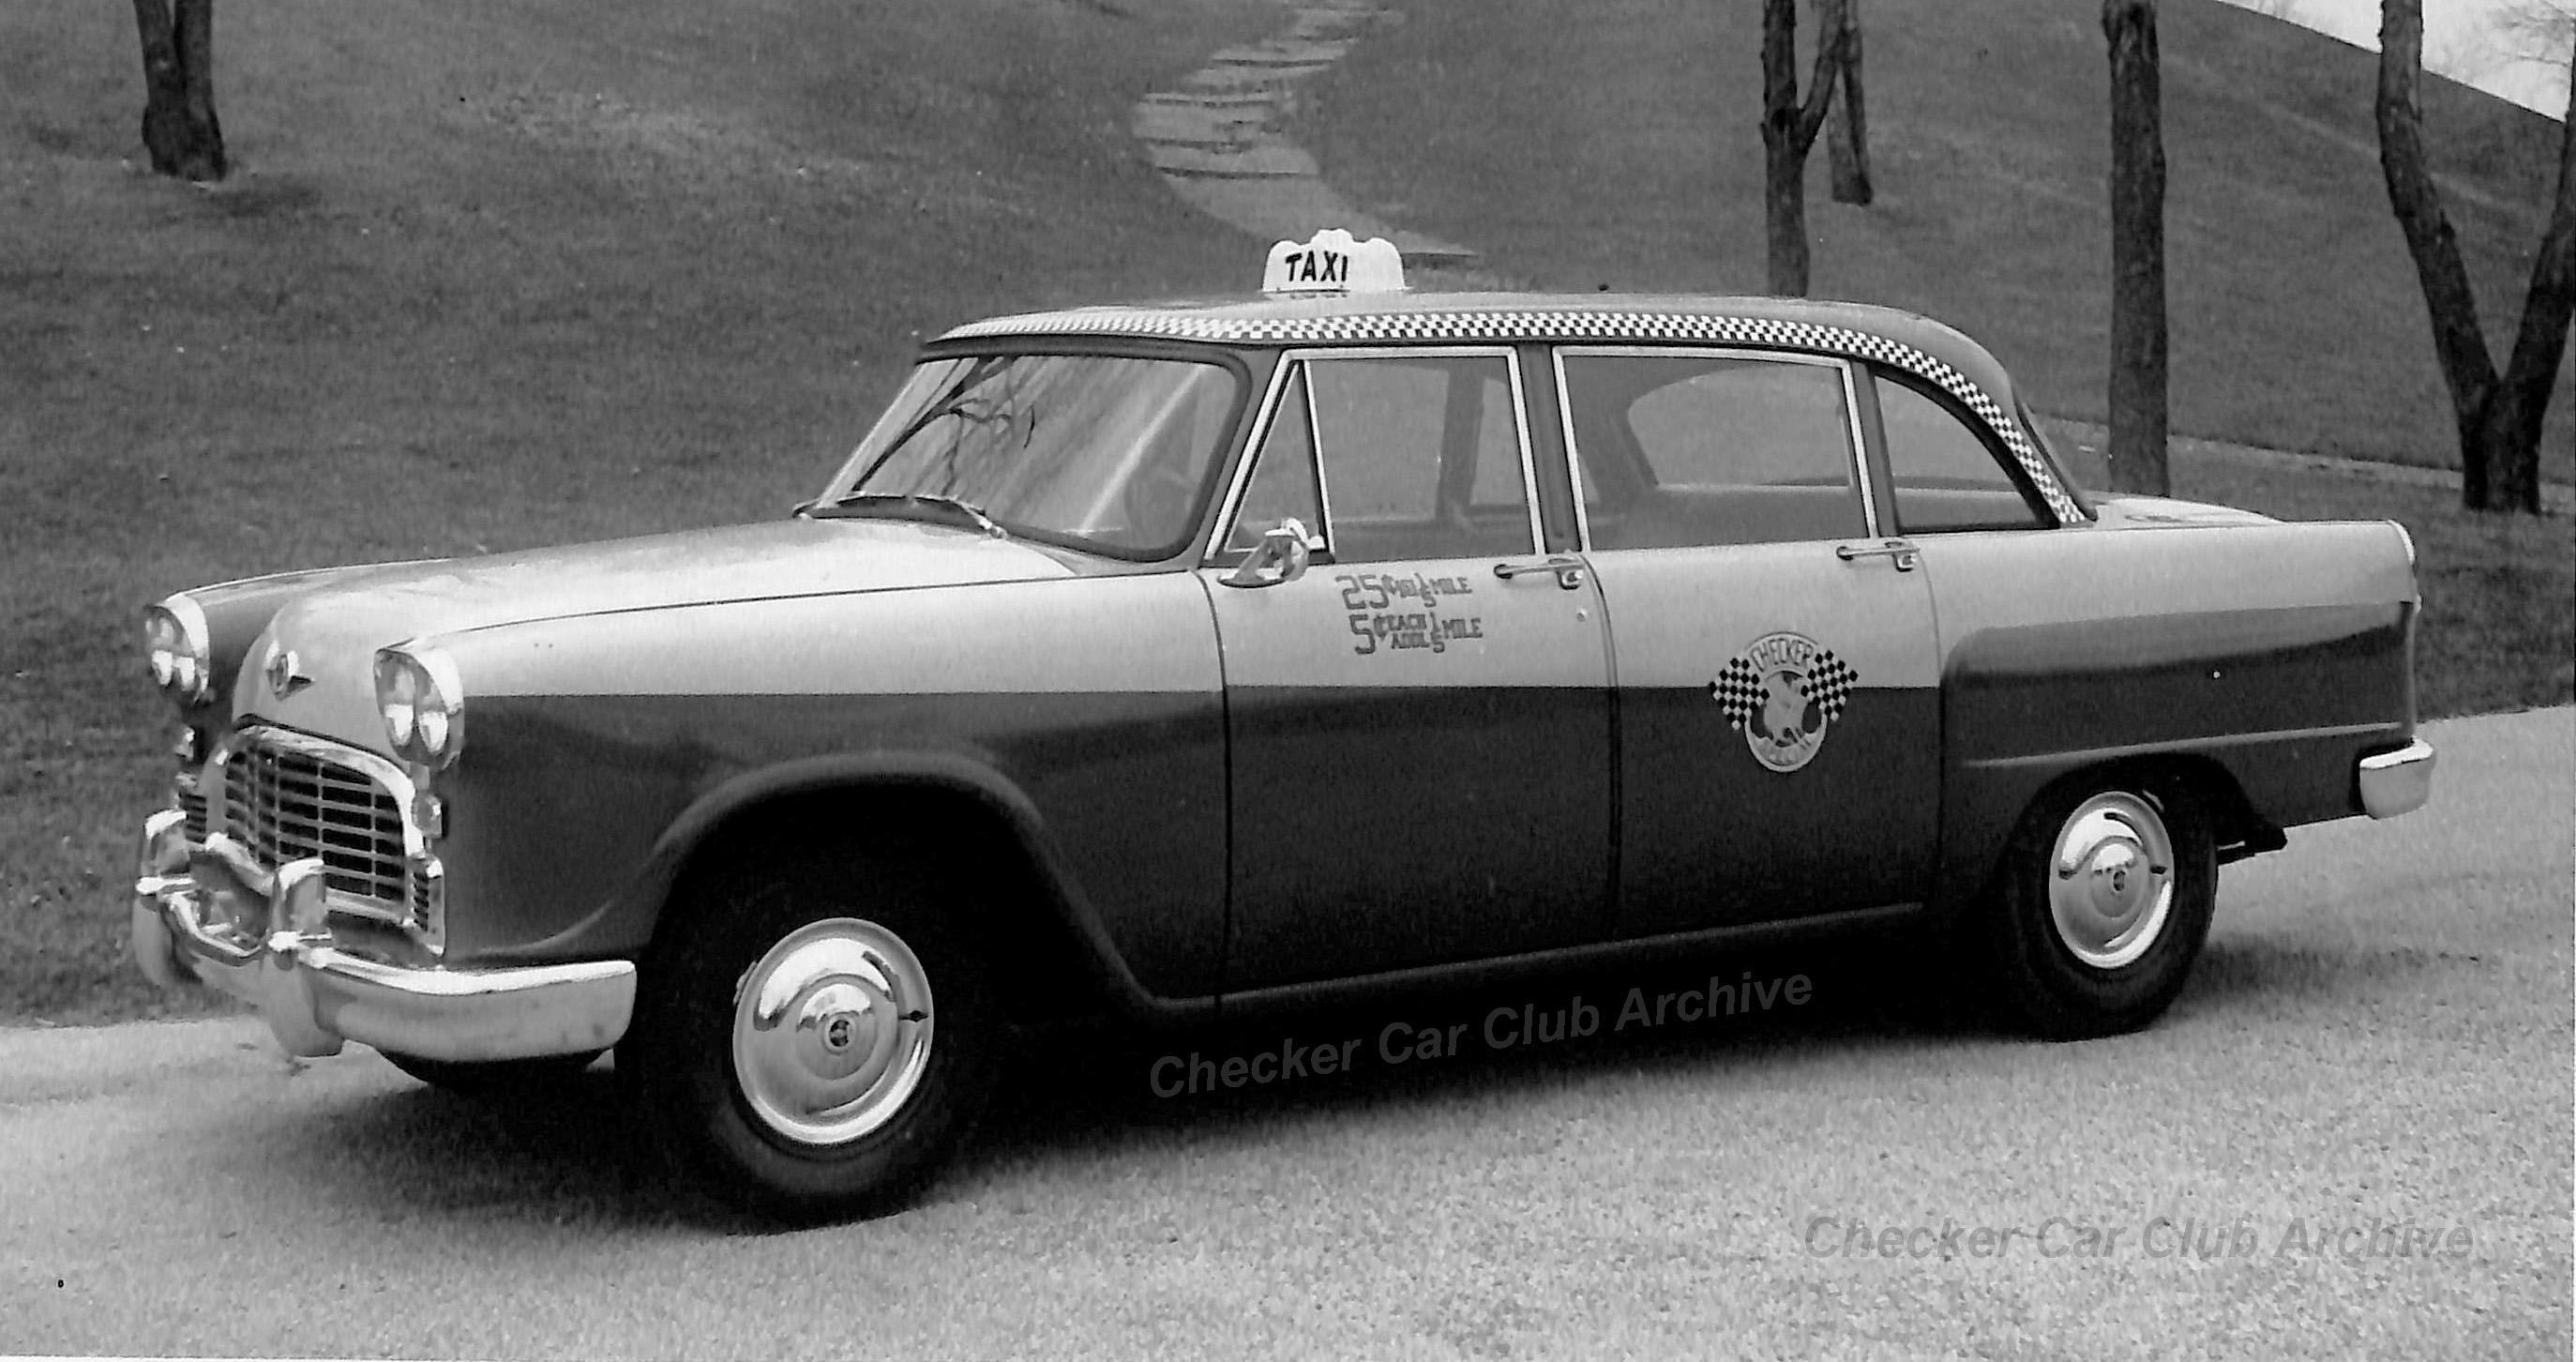 1967 Checker A-11 Taxicab Photo